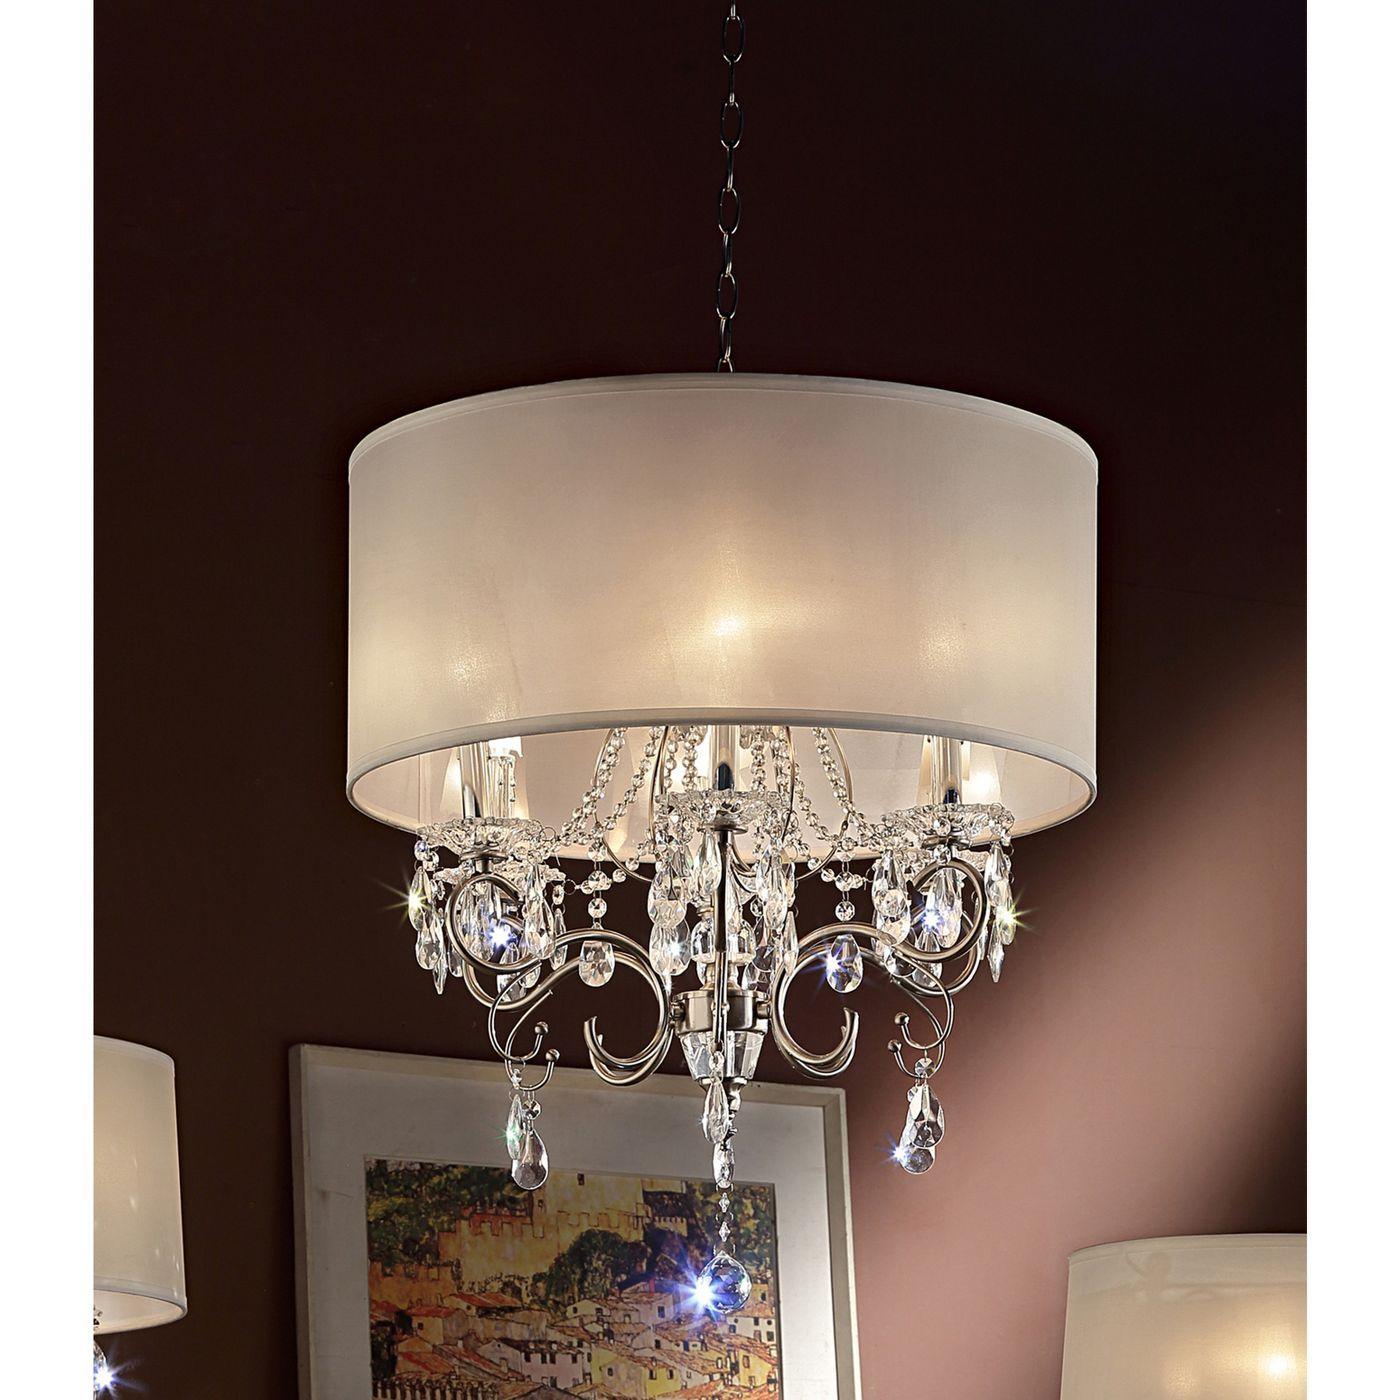 Ore International Ceiling Lights Silver (25 X 25 X 15